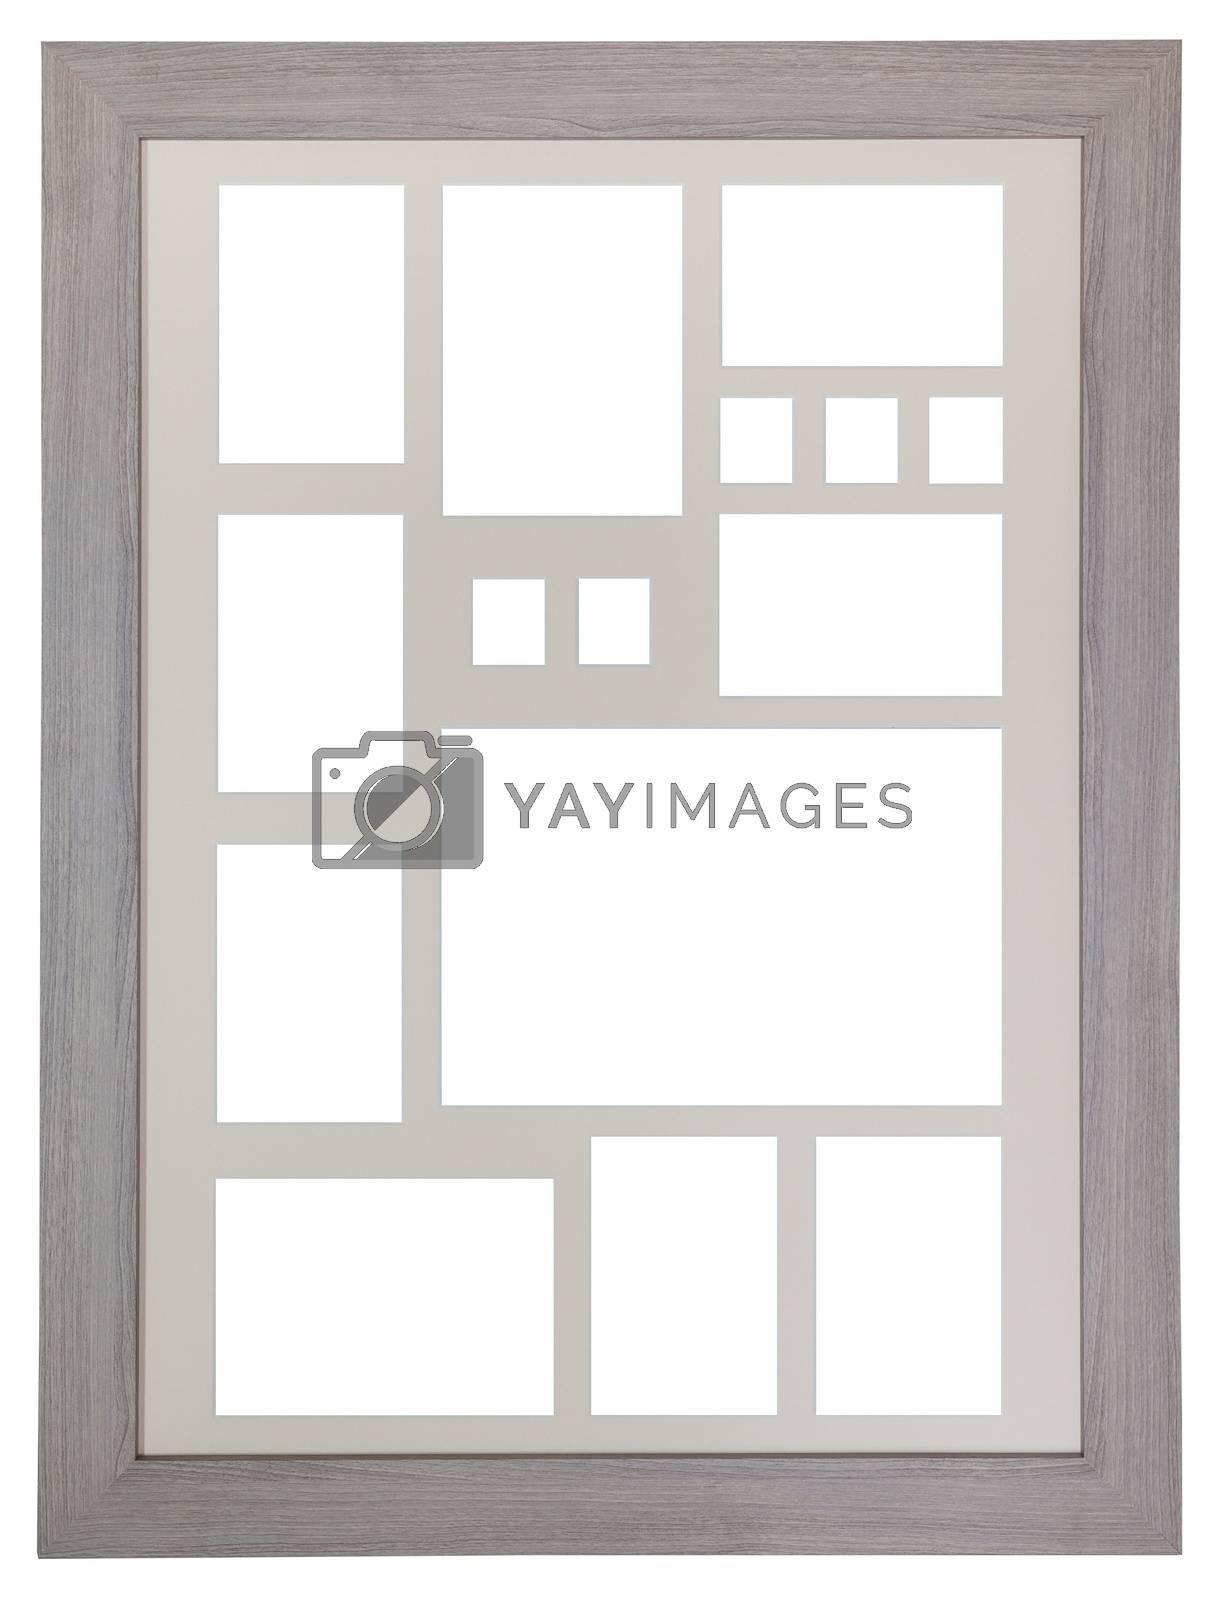 Vintage Photo frames isolated on white background